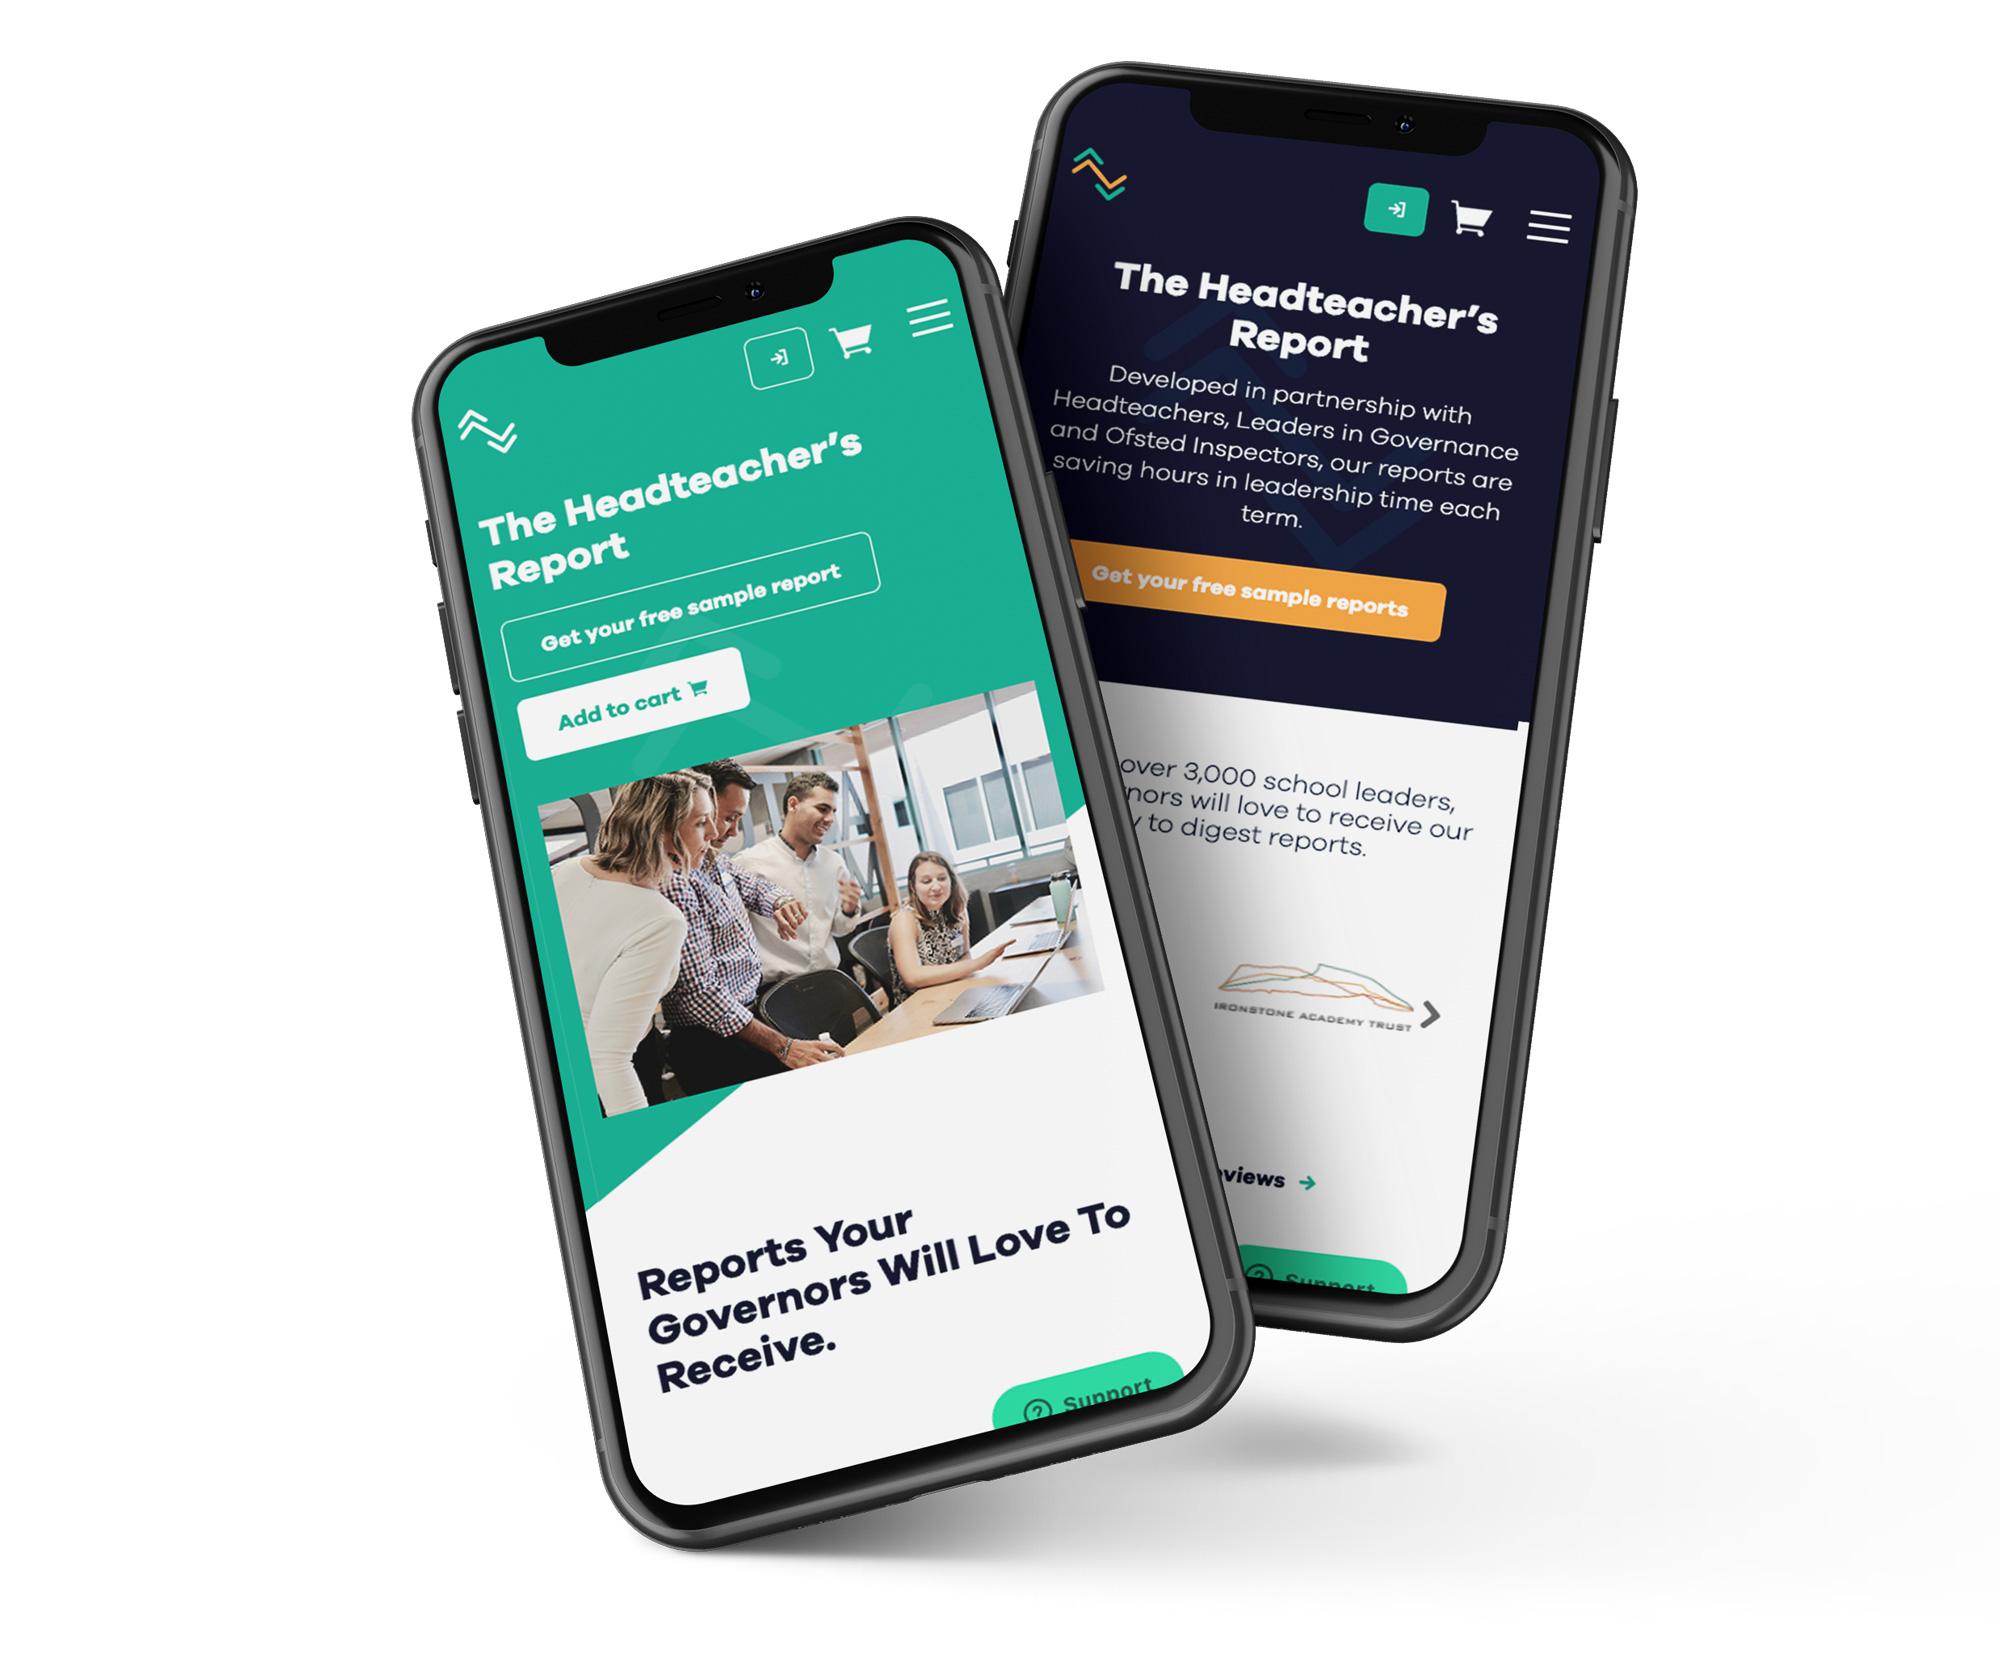 The Headteacher's Report website design